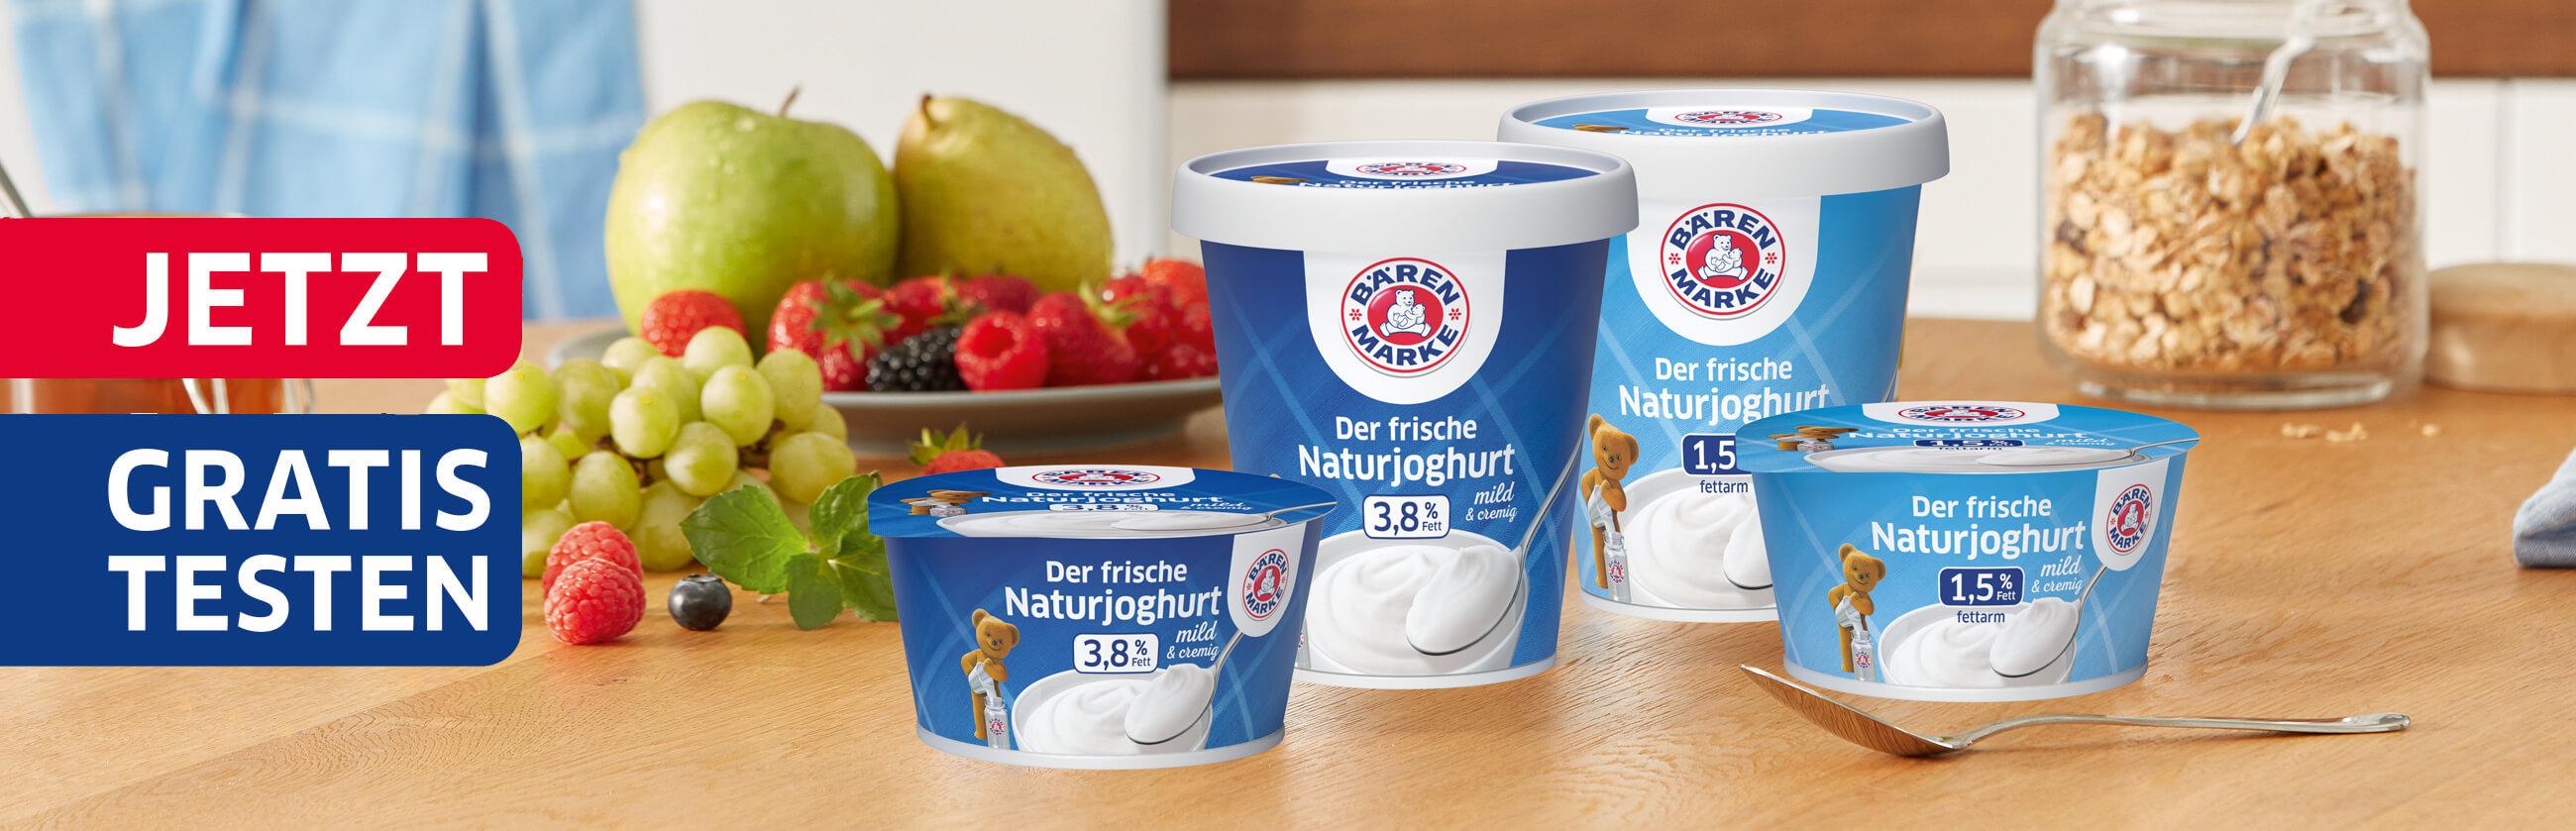 GzG Bärenmarke Naturjoghurt